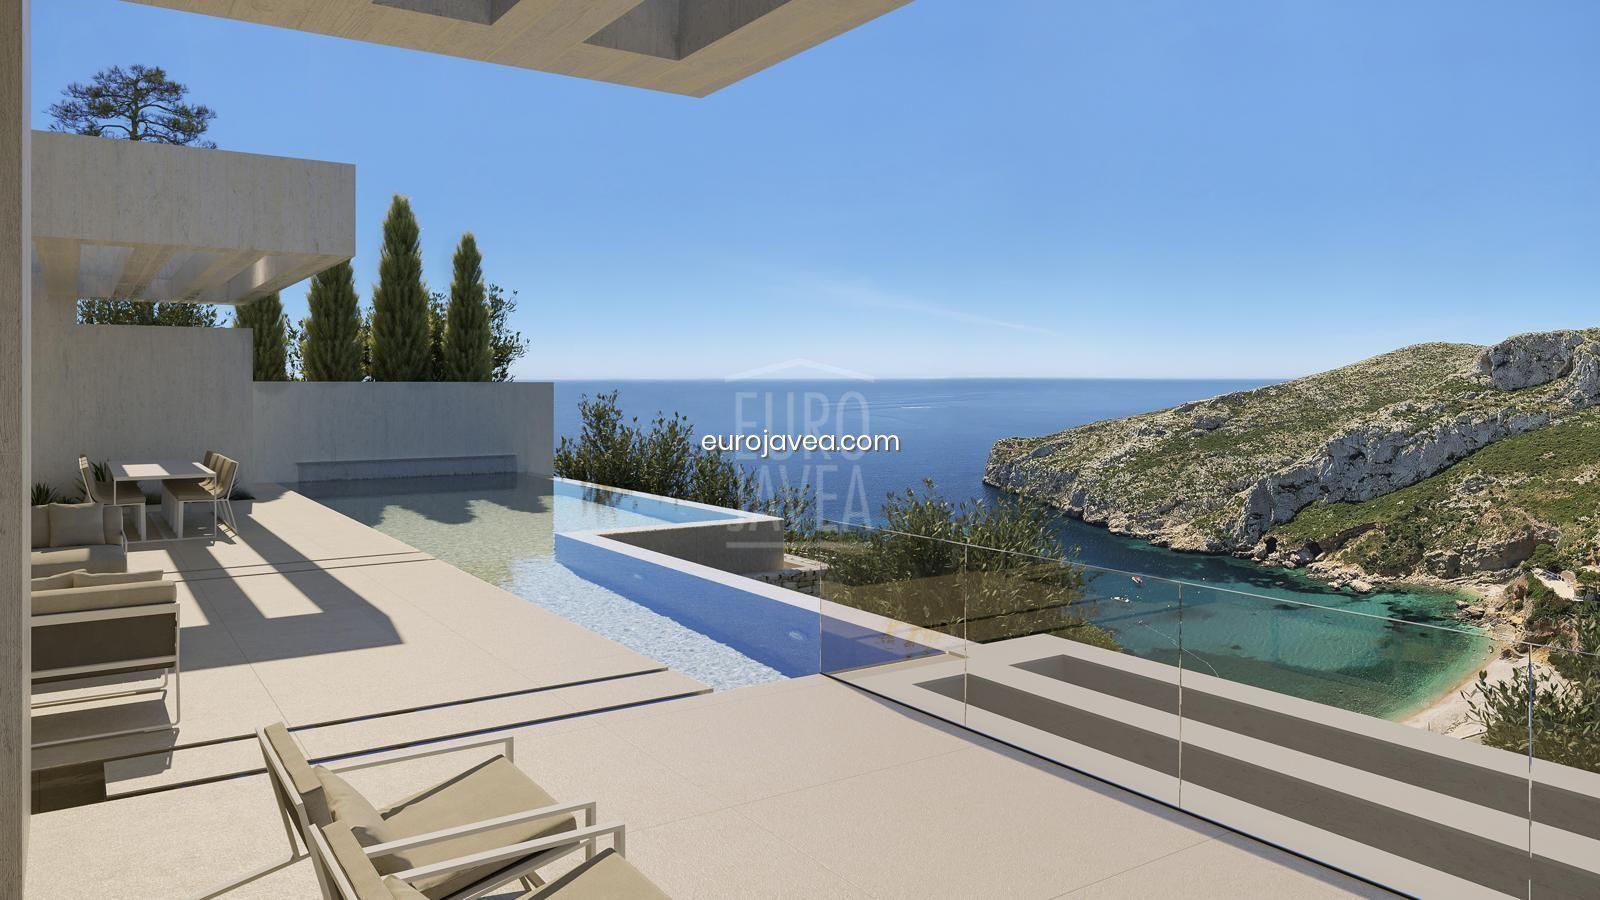 Luxurious project for sale in Jávea, located in one of the most prestigious area of La Granadella, with sea views.